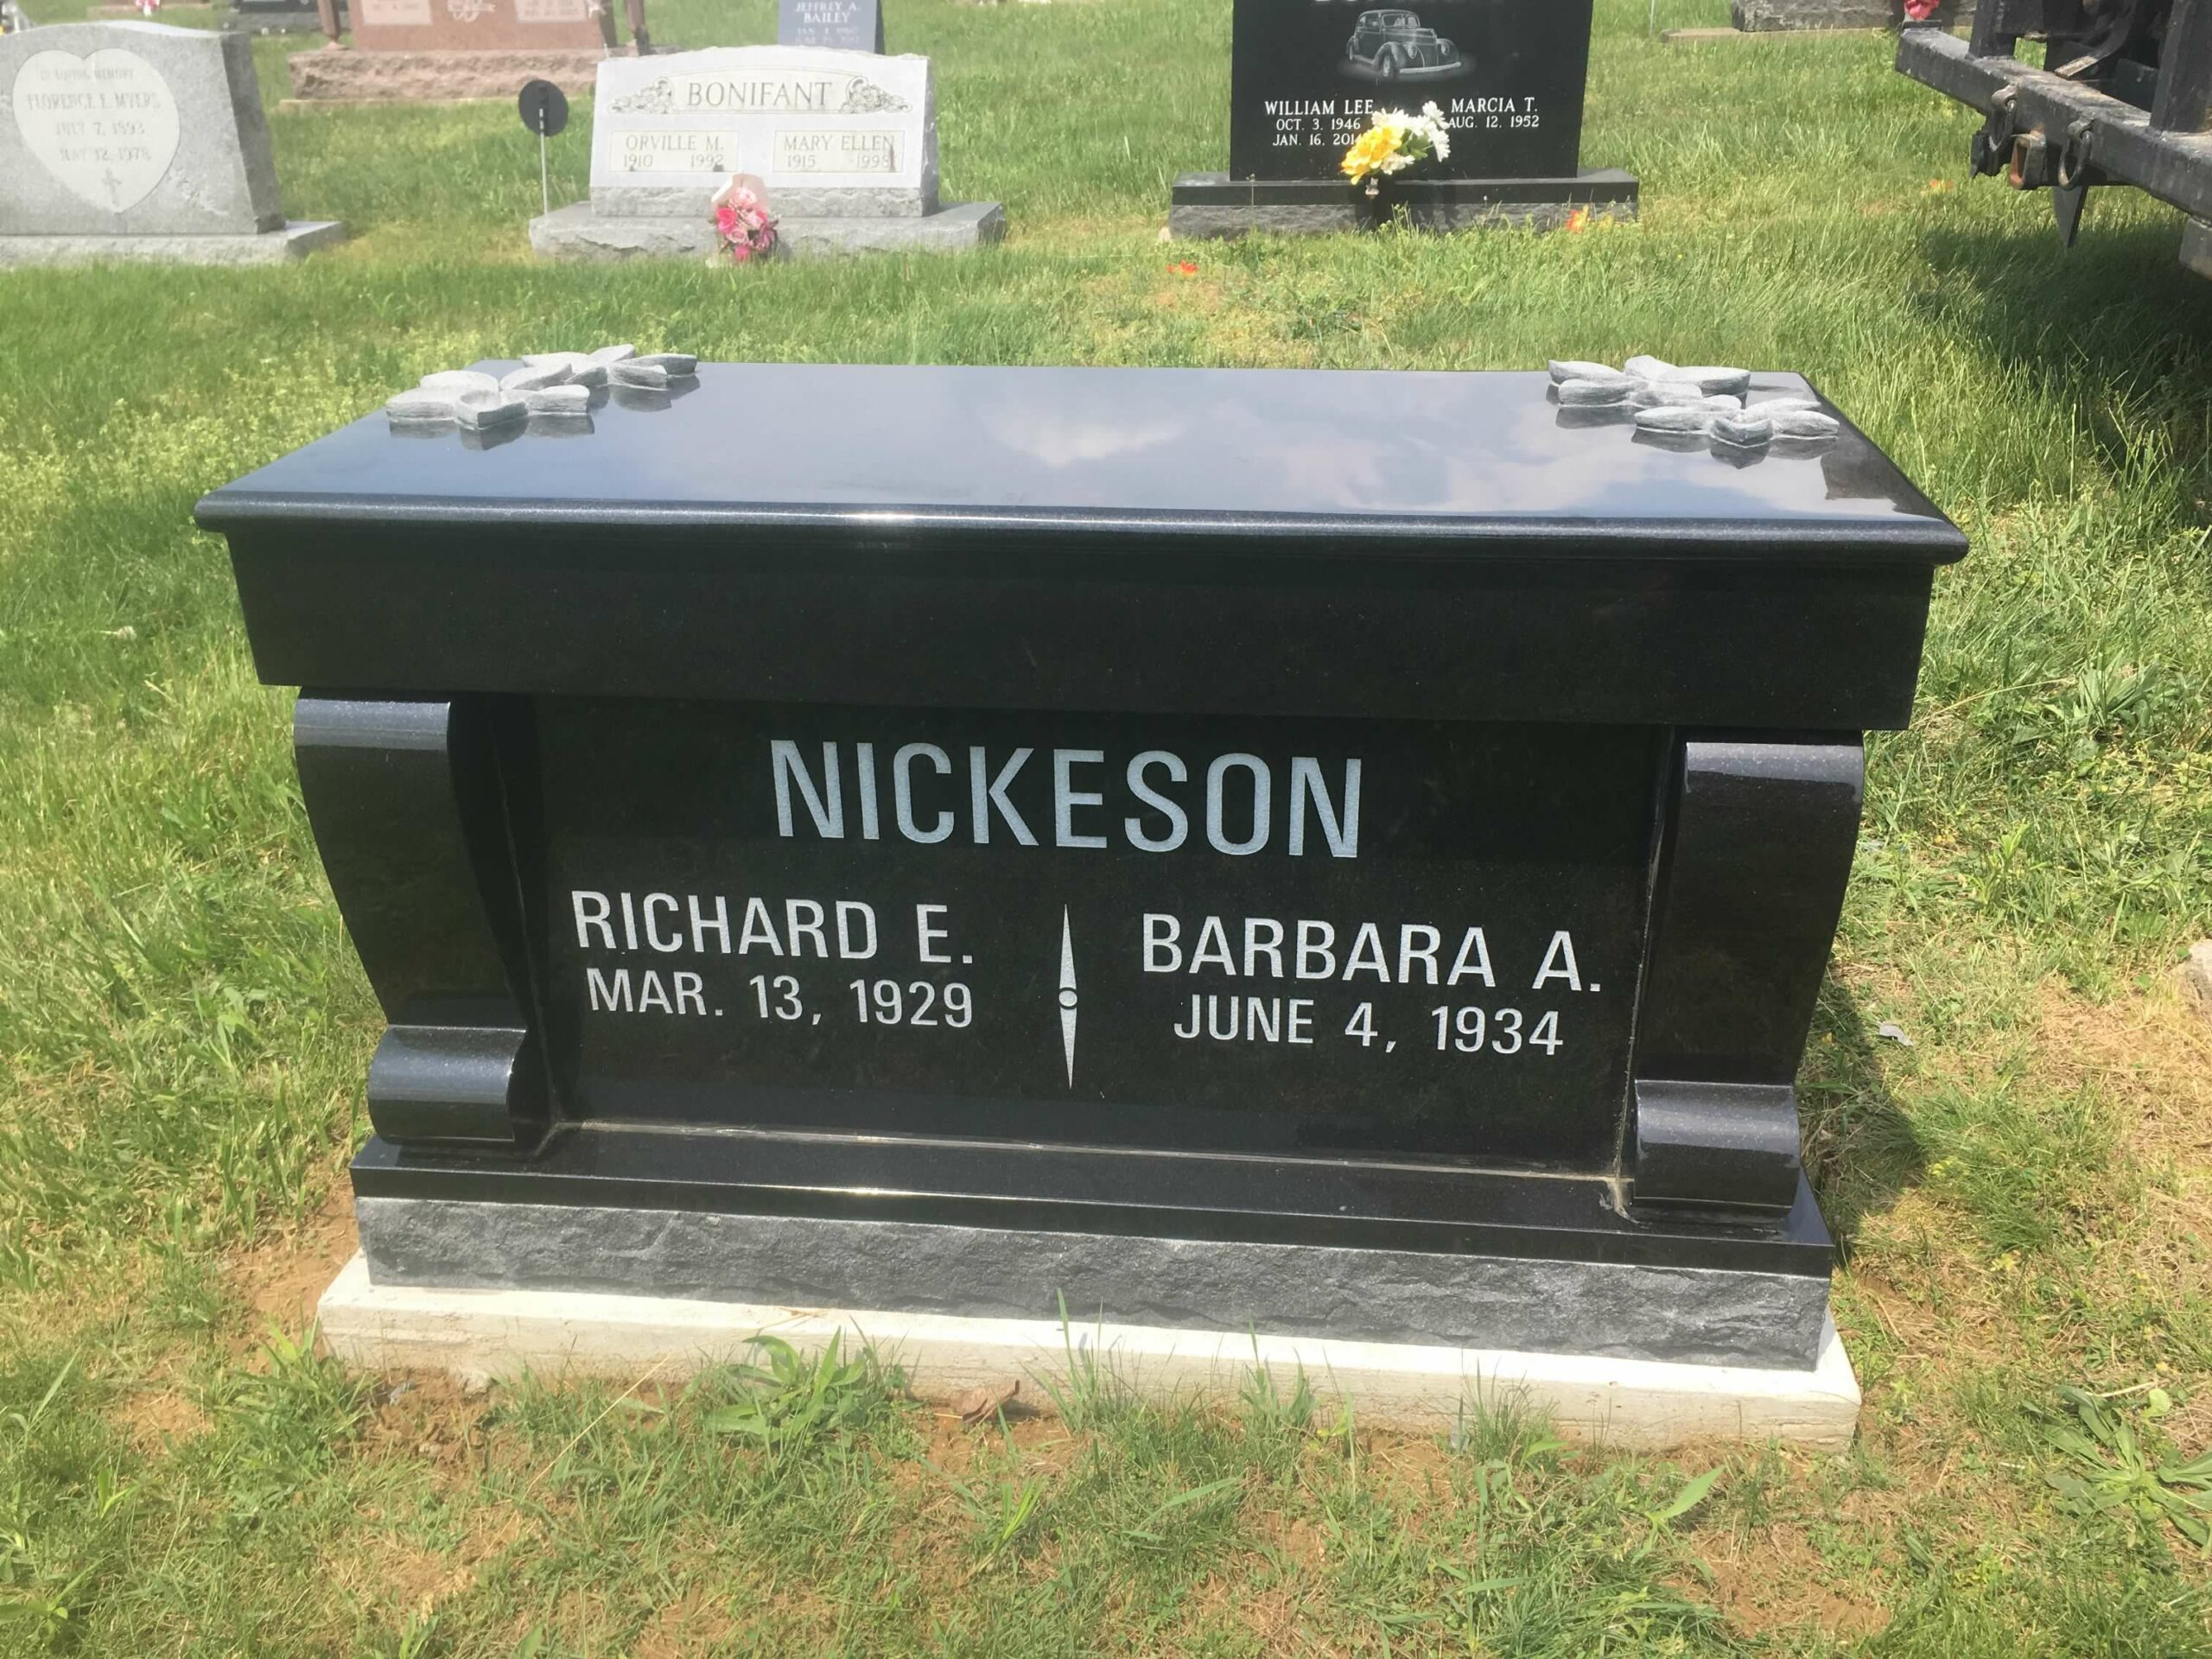 Nickeson, Richard